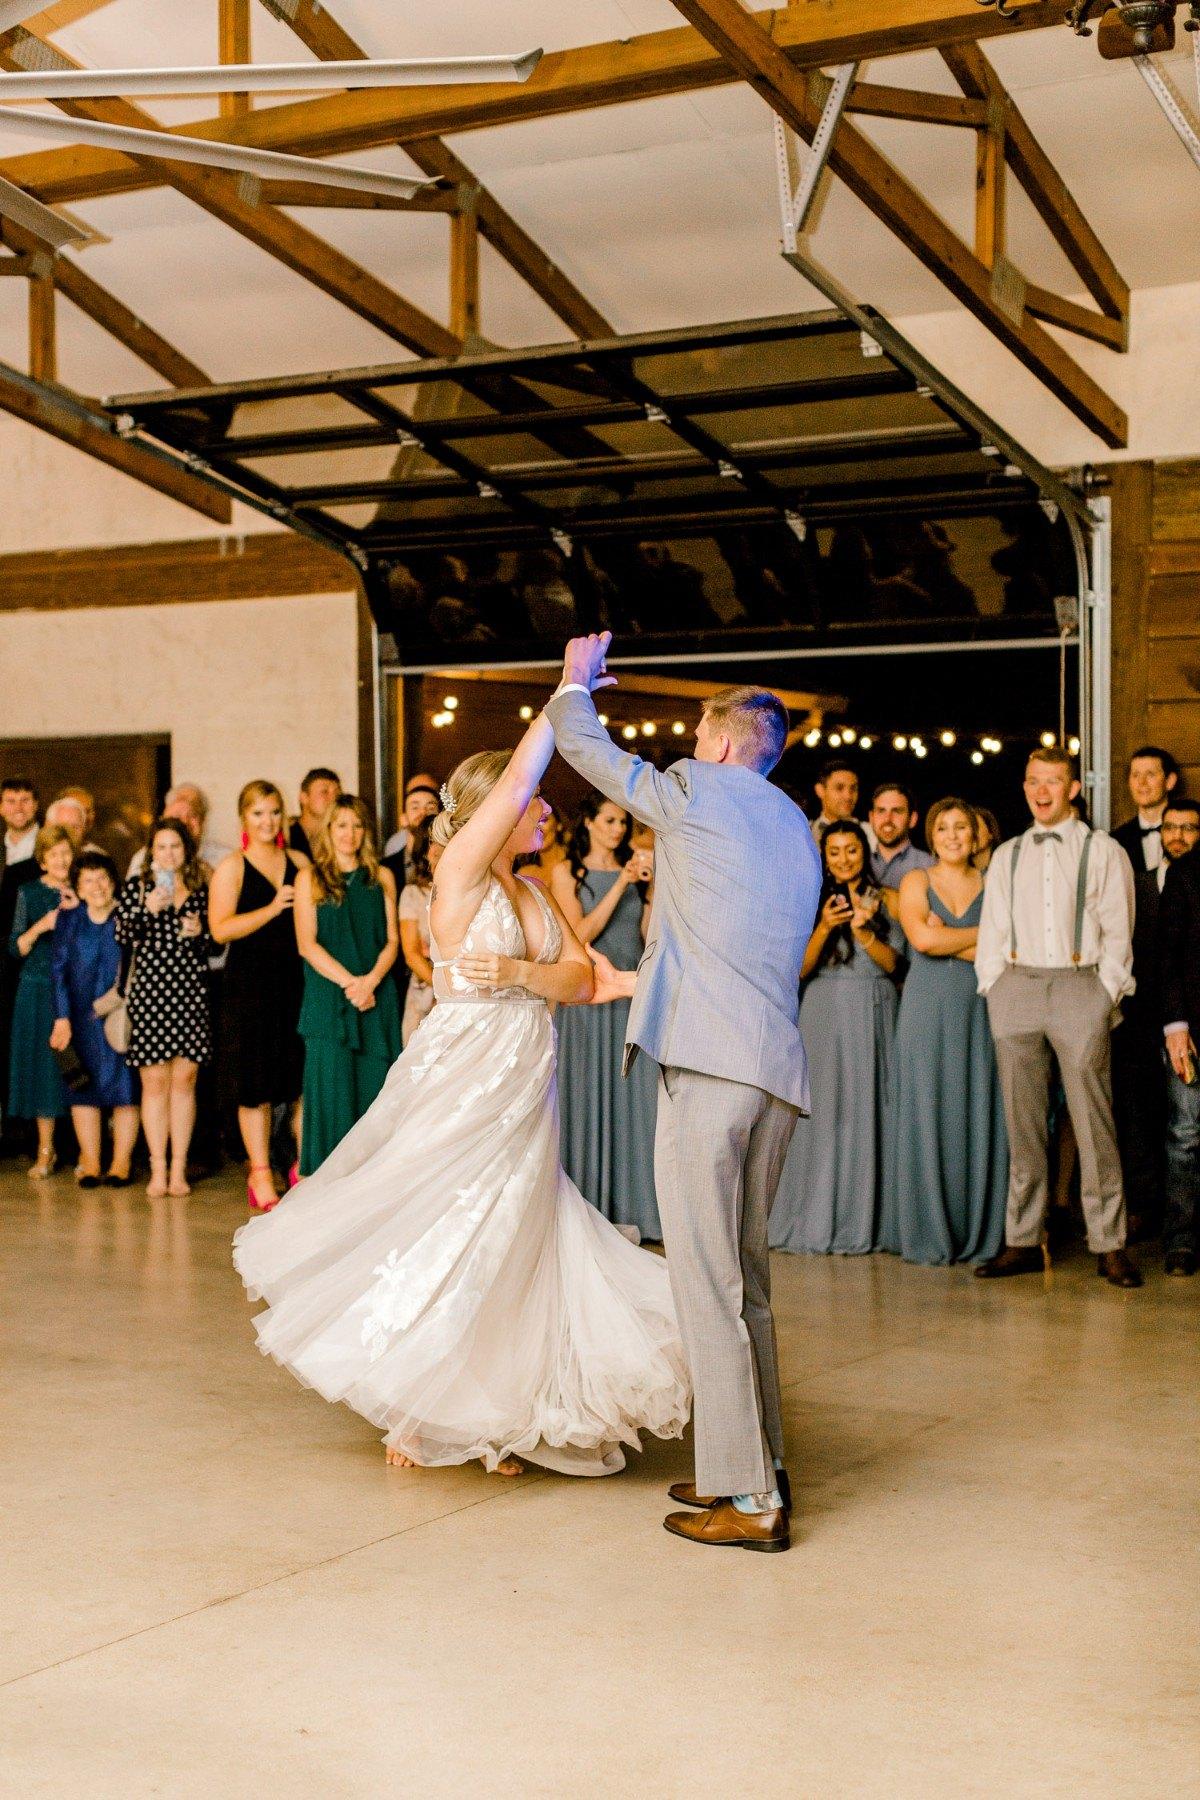 ennis-texas-wedding-photographer-kaitlyn-bullard-114.jpg